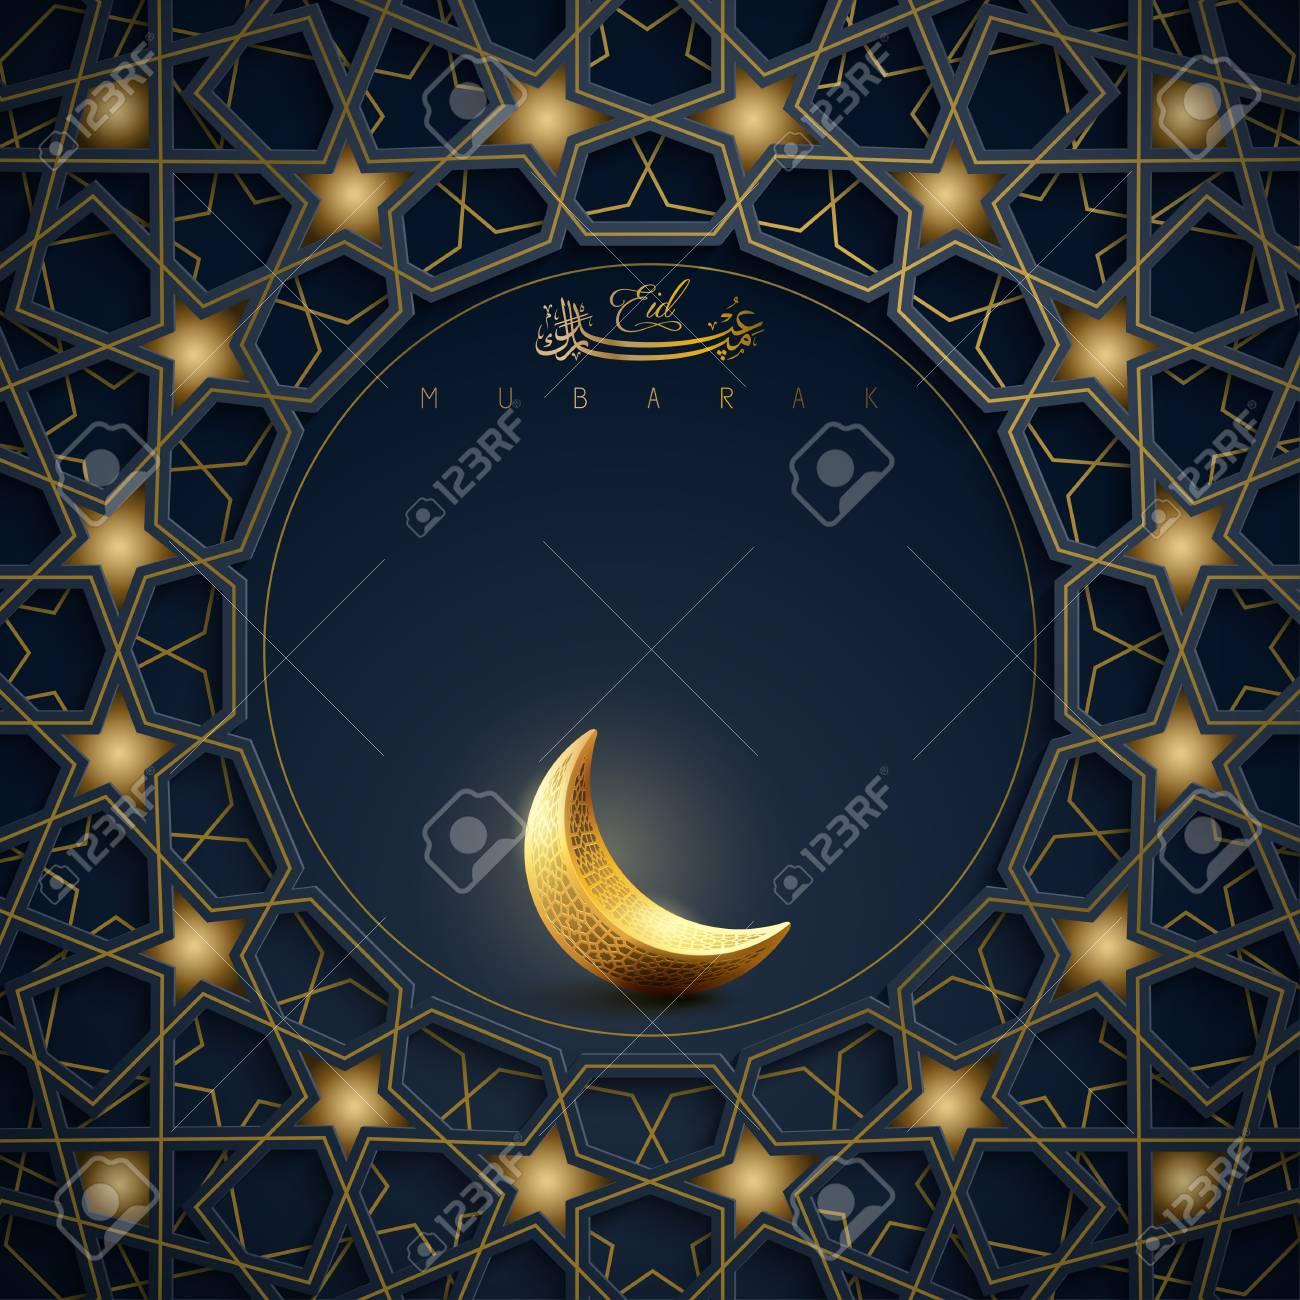 Eid Mubarak islamic greeting Abstract background with arabic ornament morocco geometric pattern - 120665802